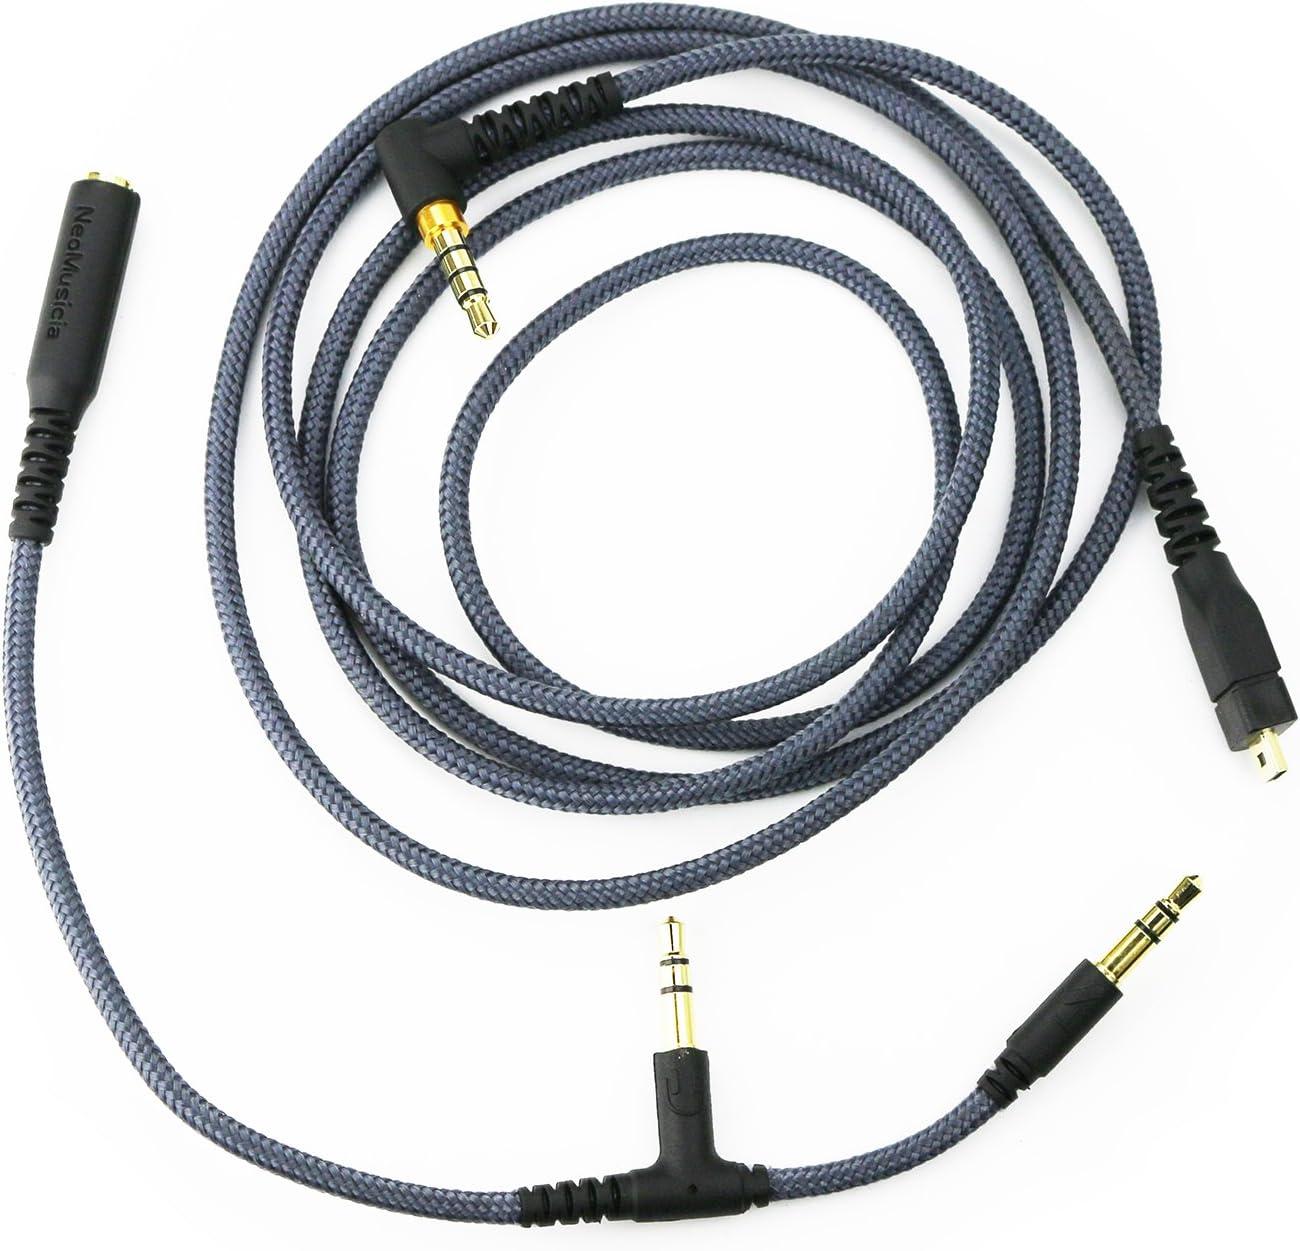 Arctis Pro Gaming Headset 6.5 Feet Arctis Pro Wireless Arctis Replacement Cable for SteelSeries Arctis 3 Arctis 7 Arctis 5